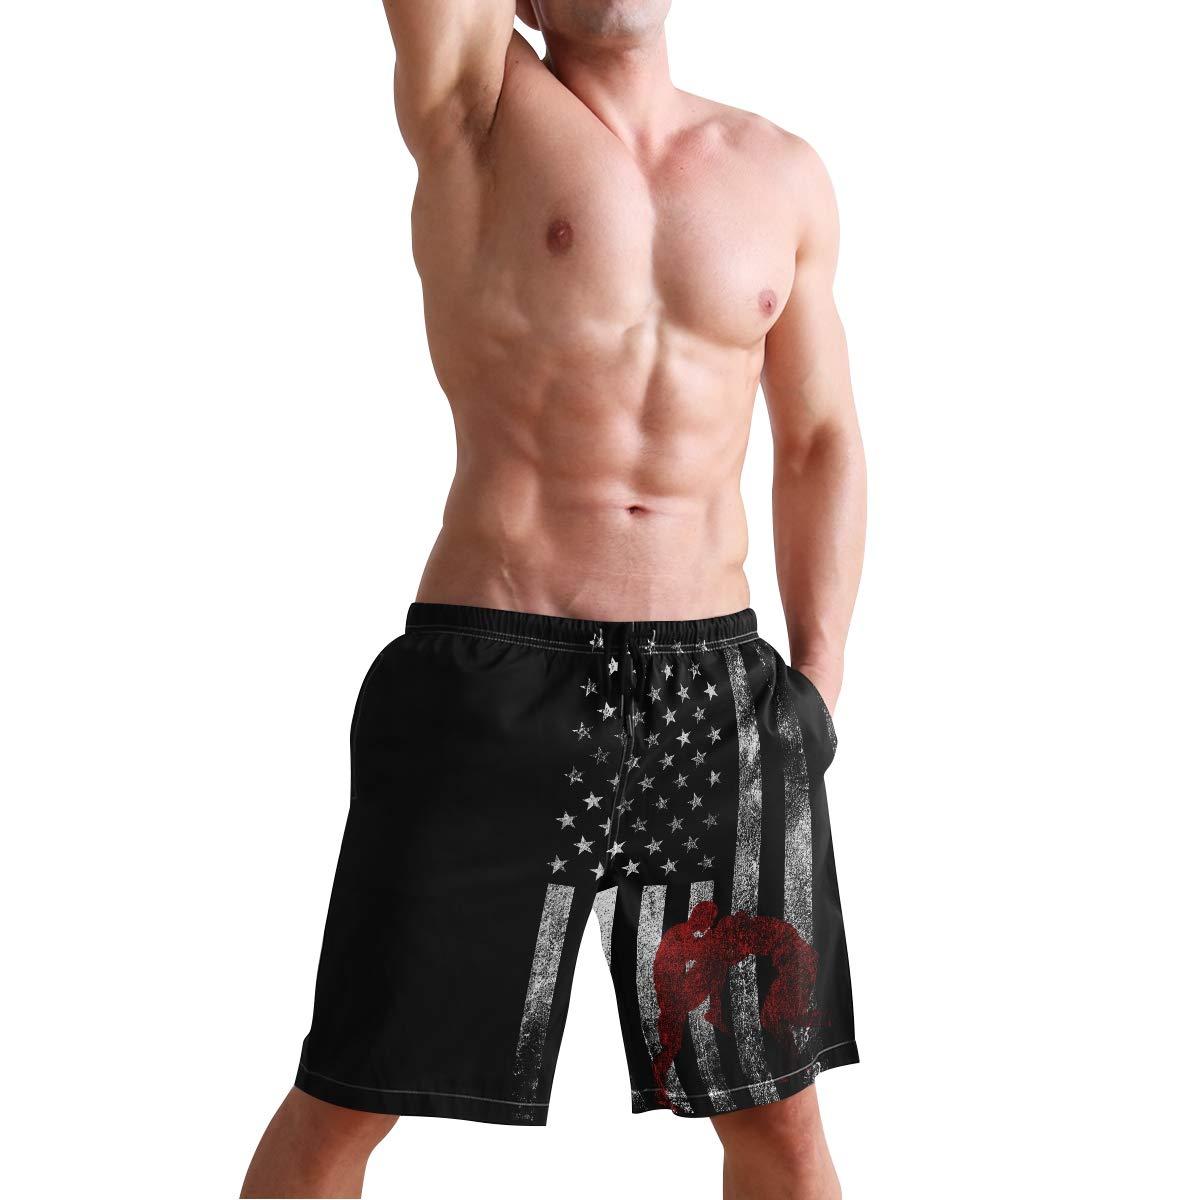 DongDongQiang Men Summer Wrestling Wrestler USA Flag Quick Dry Volleyball Beach Shorts Board Shorts